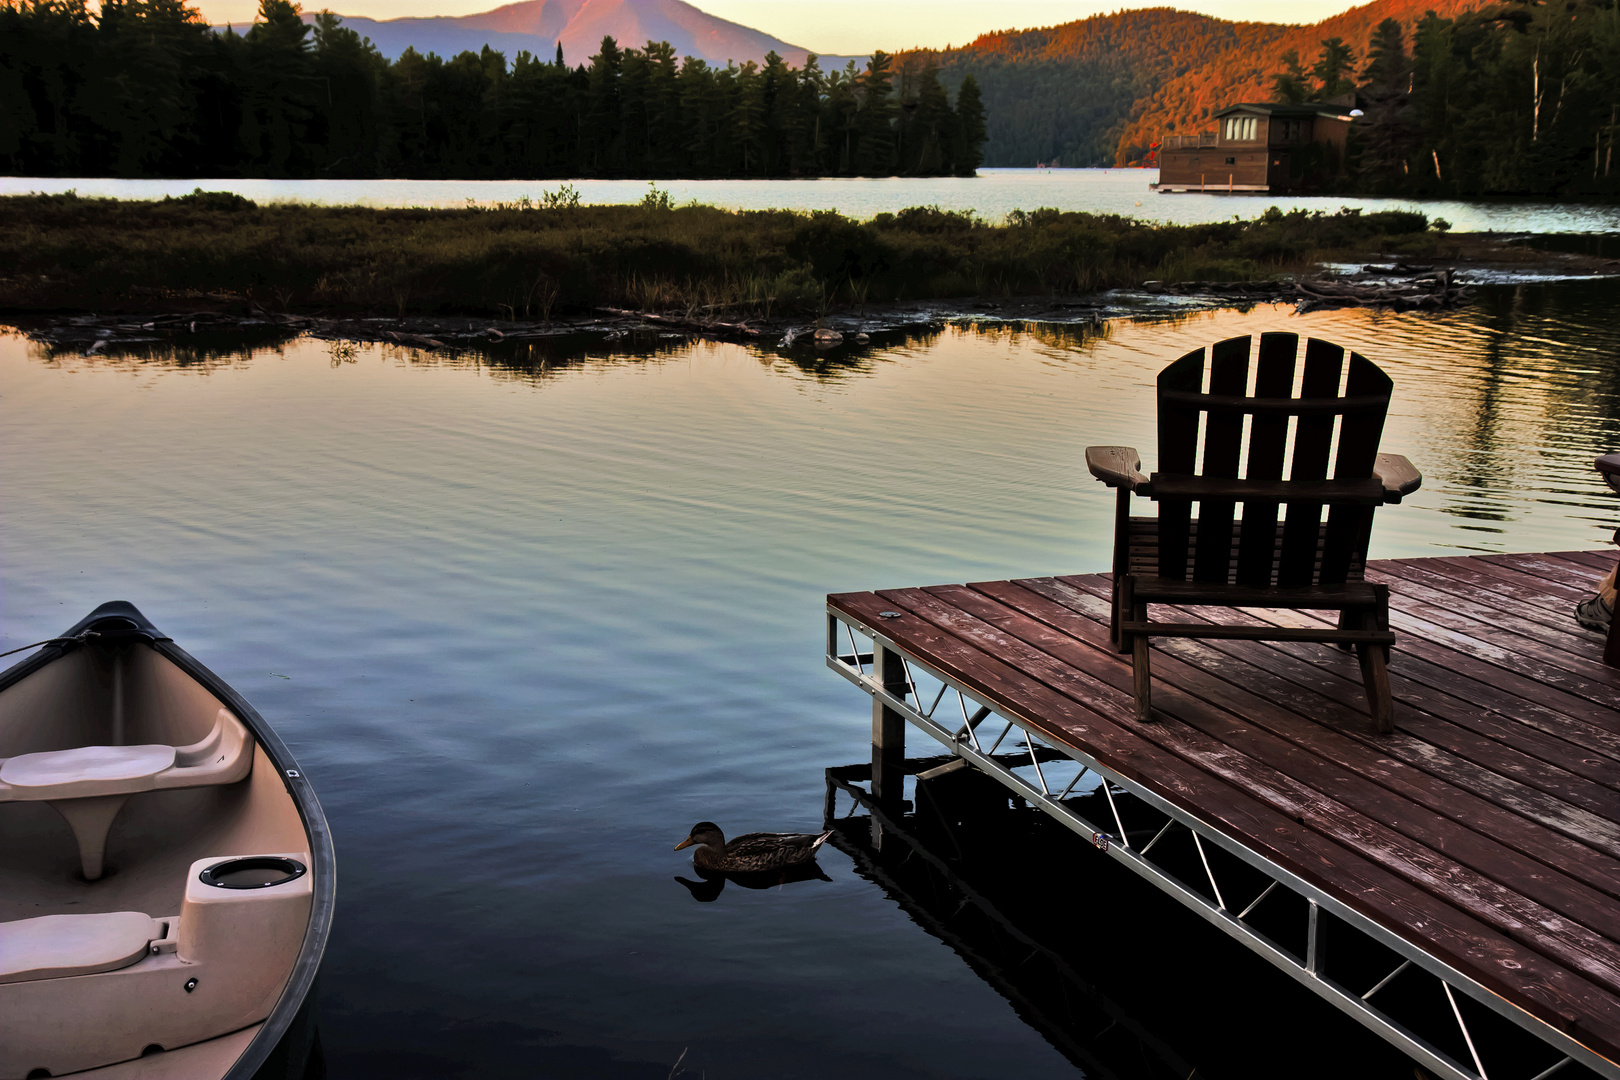 Adirondacks sunset